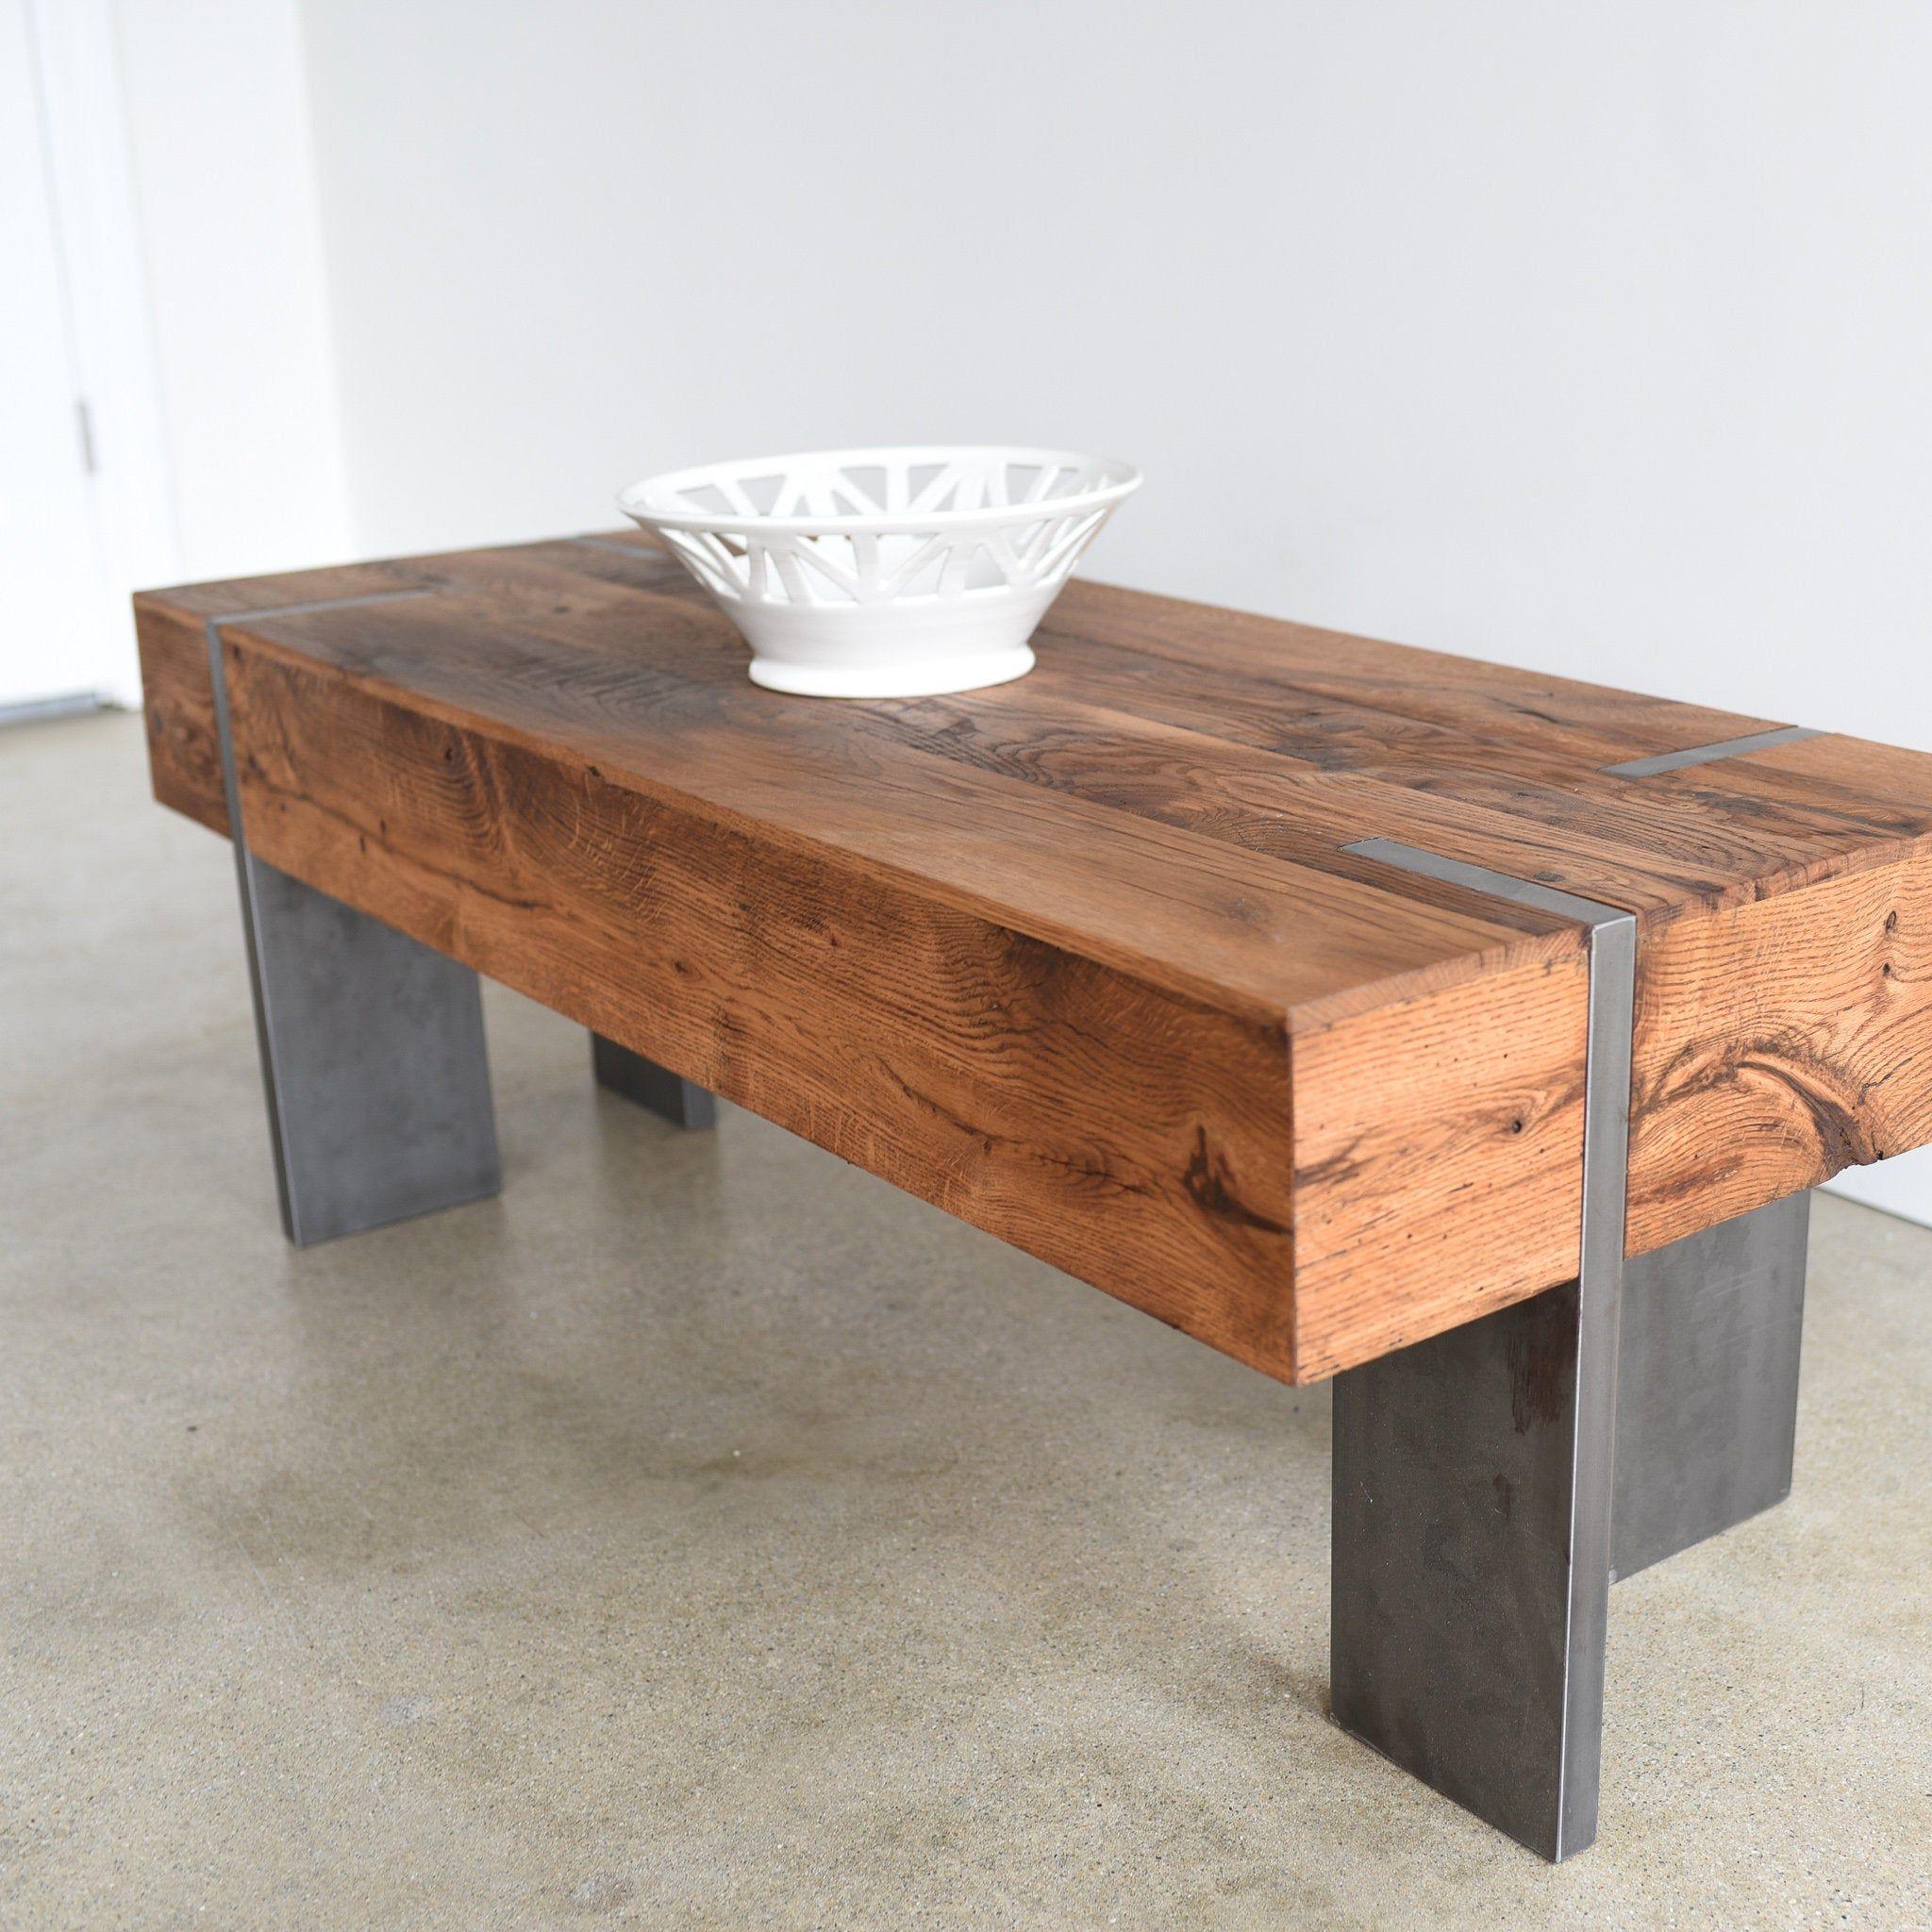 Beam Block Table Decor Block Table Coffee Table [ 1000 x 1000 Pixel ]